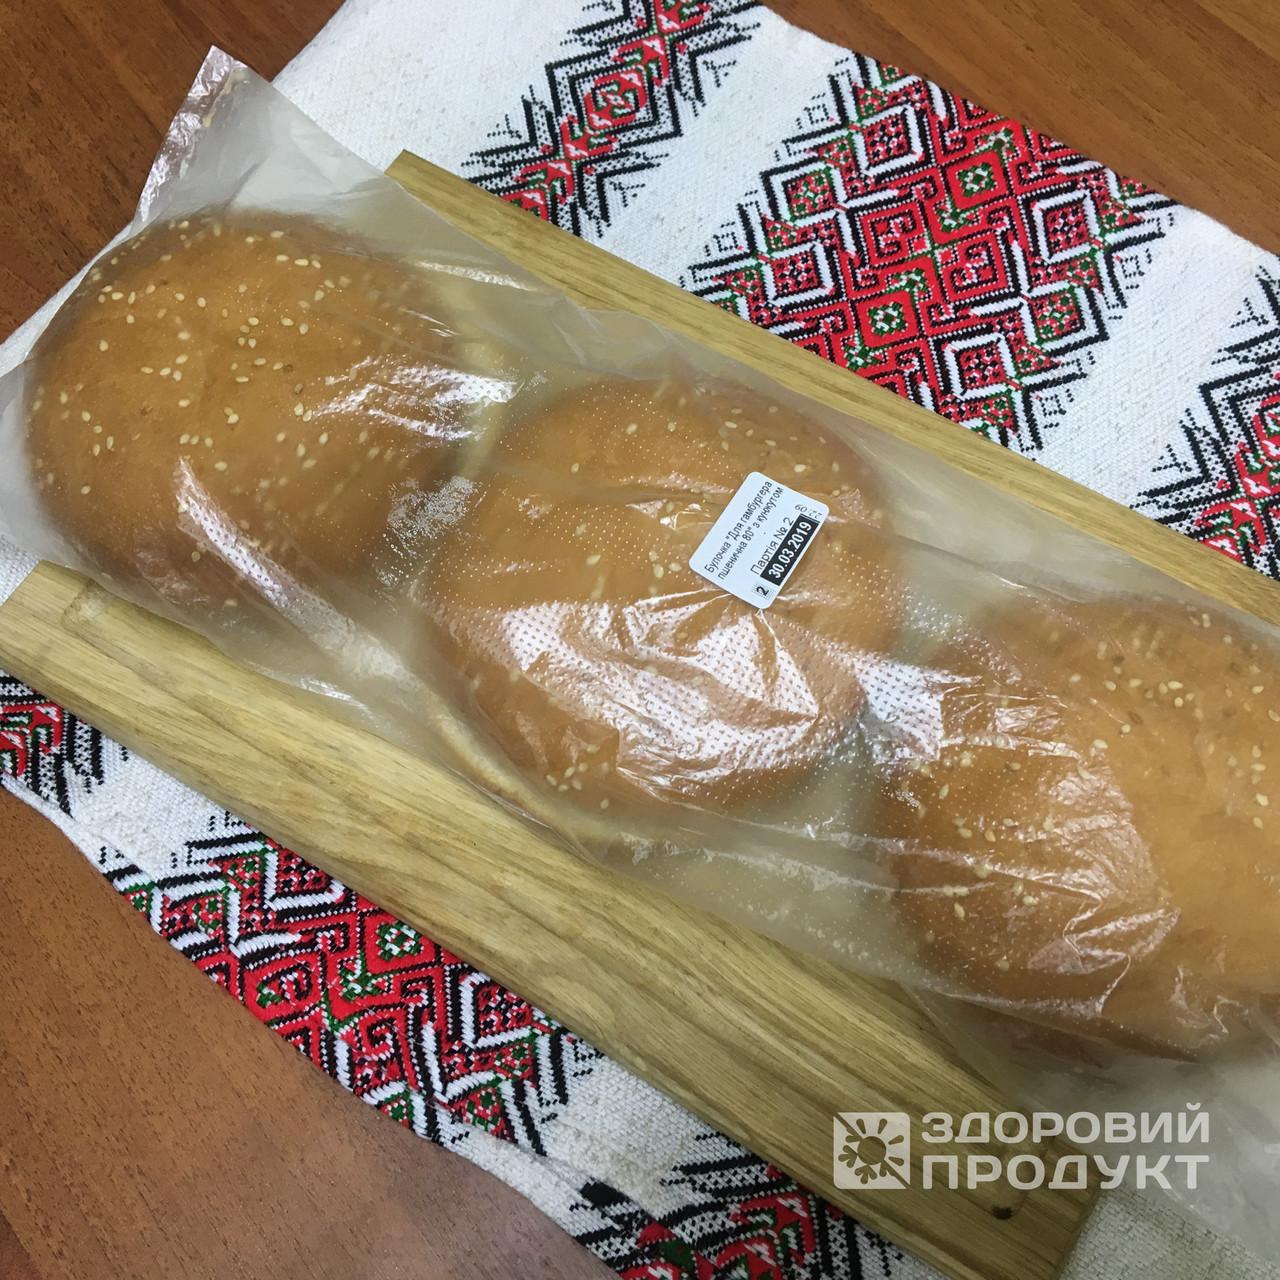 Булочка пшеничная для гамбургера с кунжутом 80 гр. (27шт.) оптом